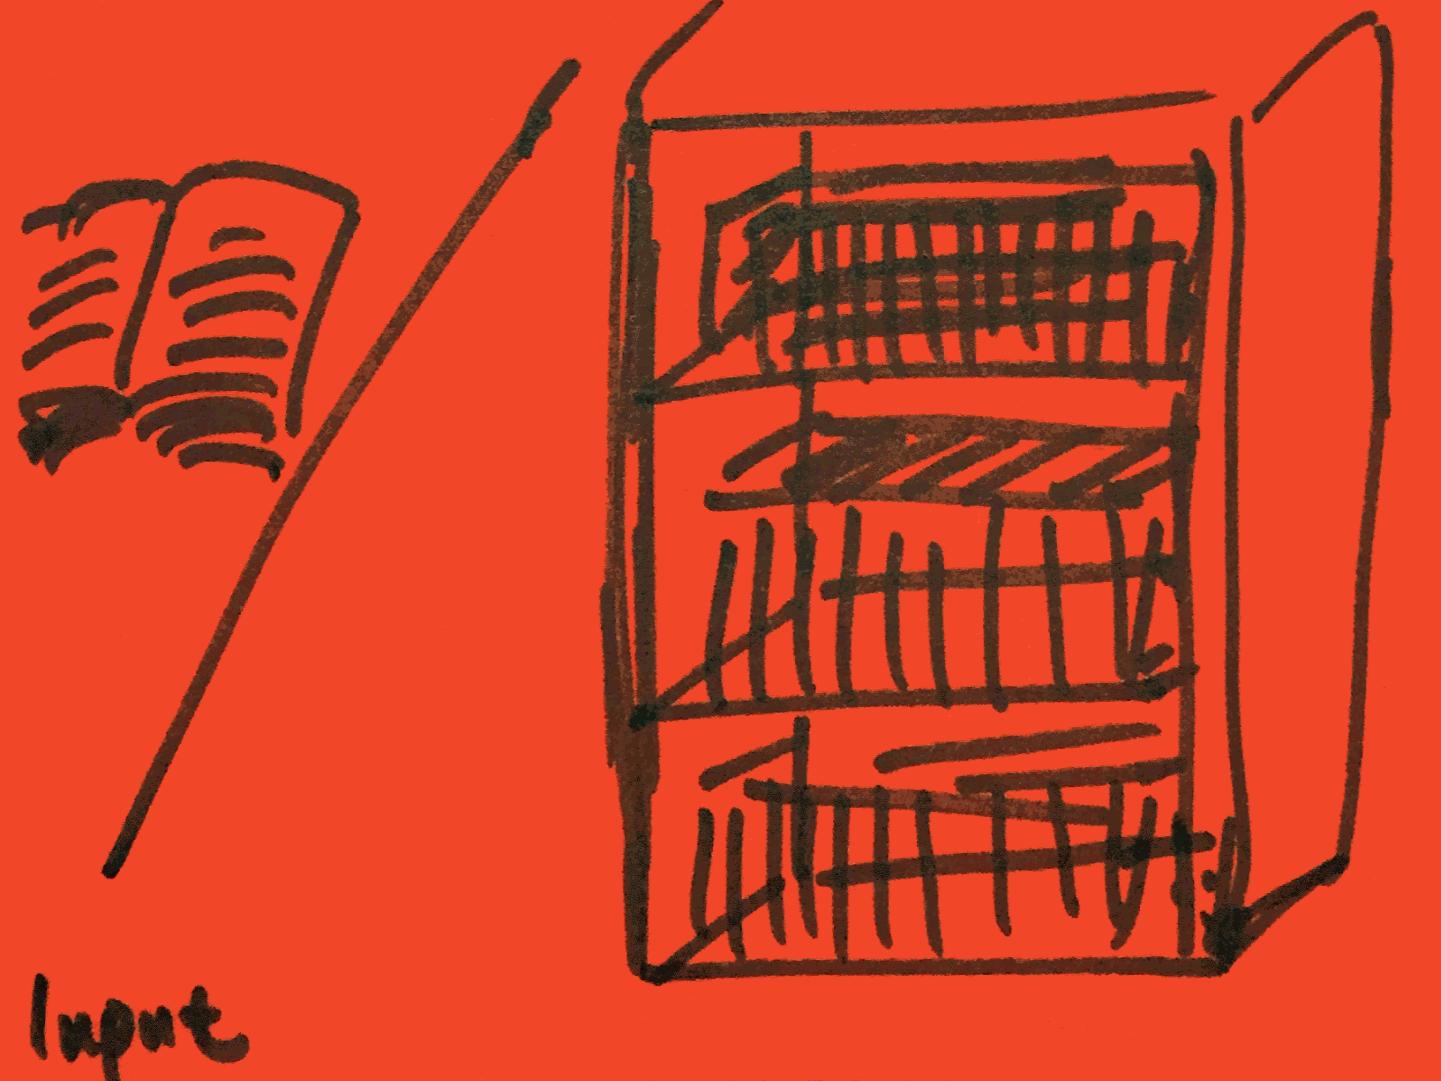 Input StrengthsFinder Singapore Book Shelves